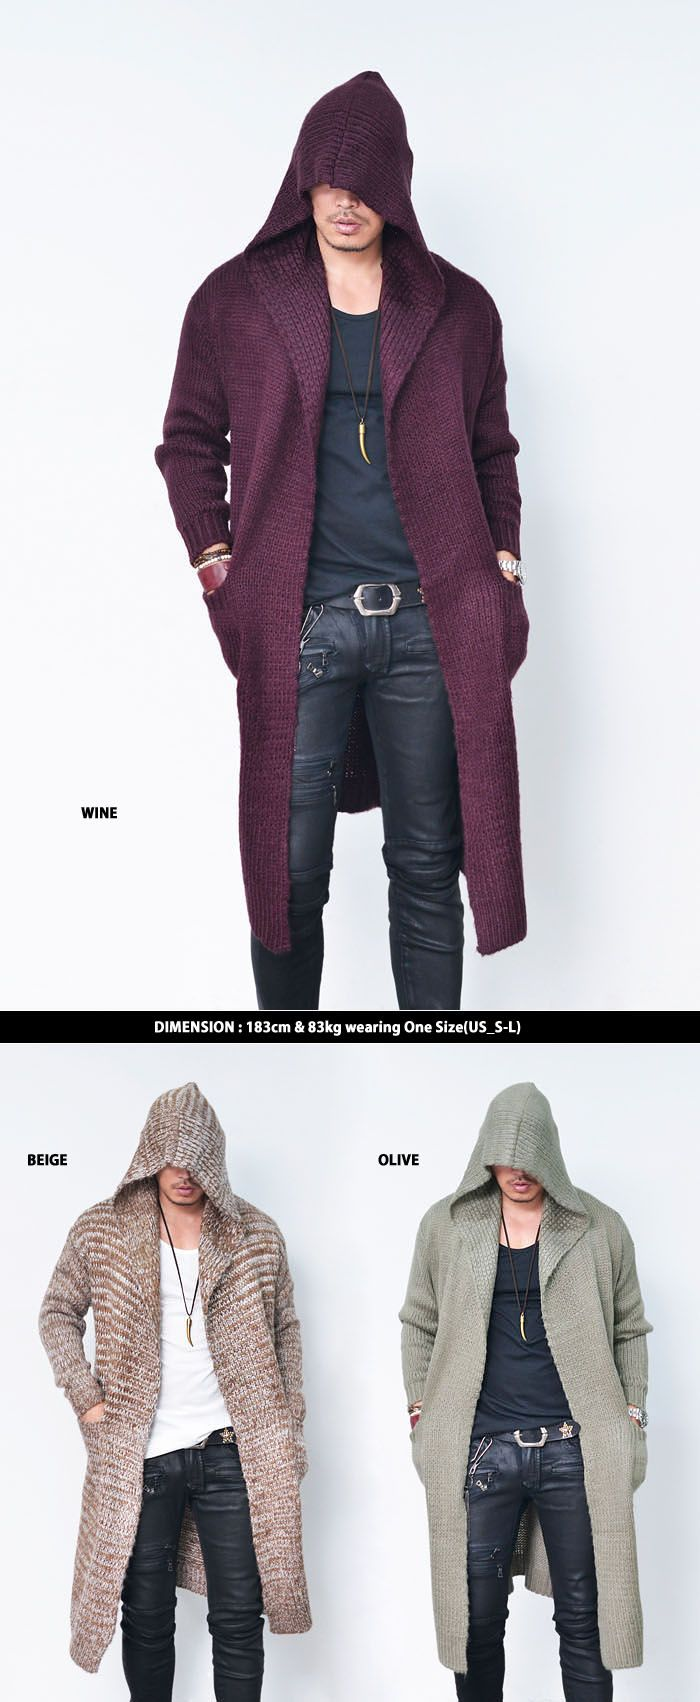 Big Hood Wool Cape Long Jacket Cardigan 142 Mens Fashion Clothing 13e0d1495